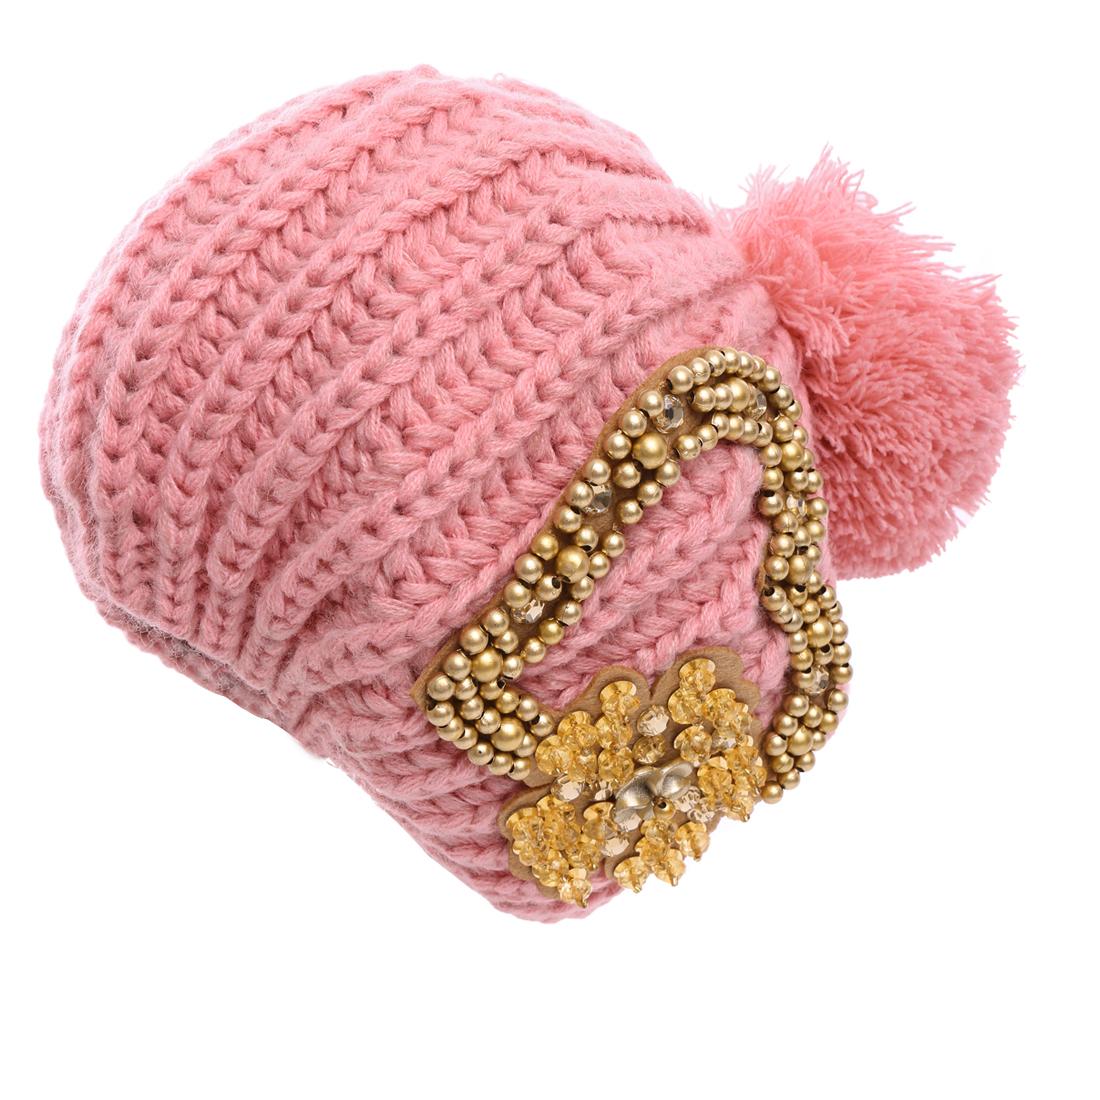 Ladies Braided Design Beads Decor Knitting Beanie Hat Pink